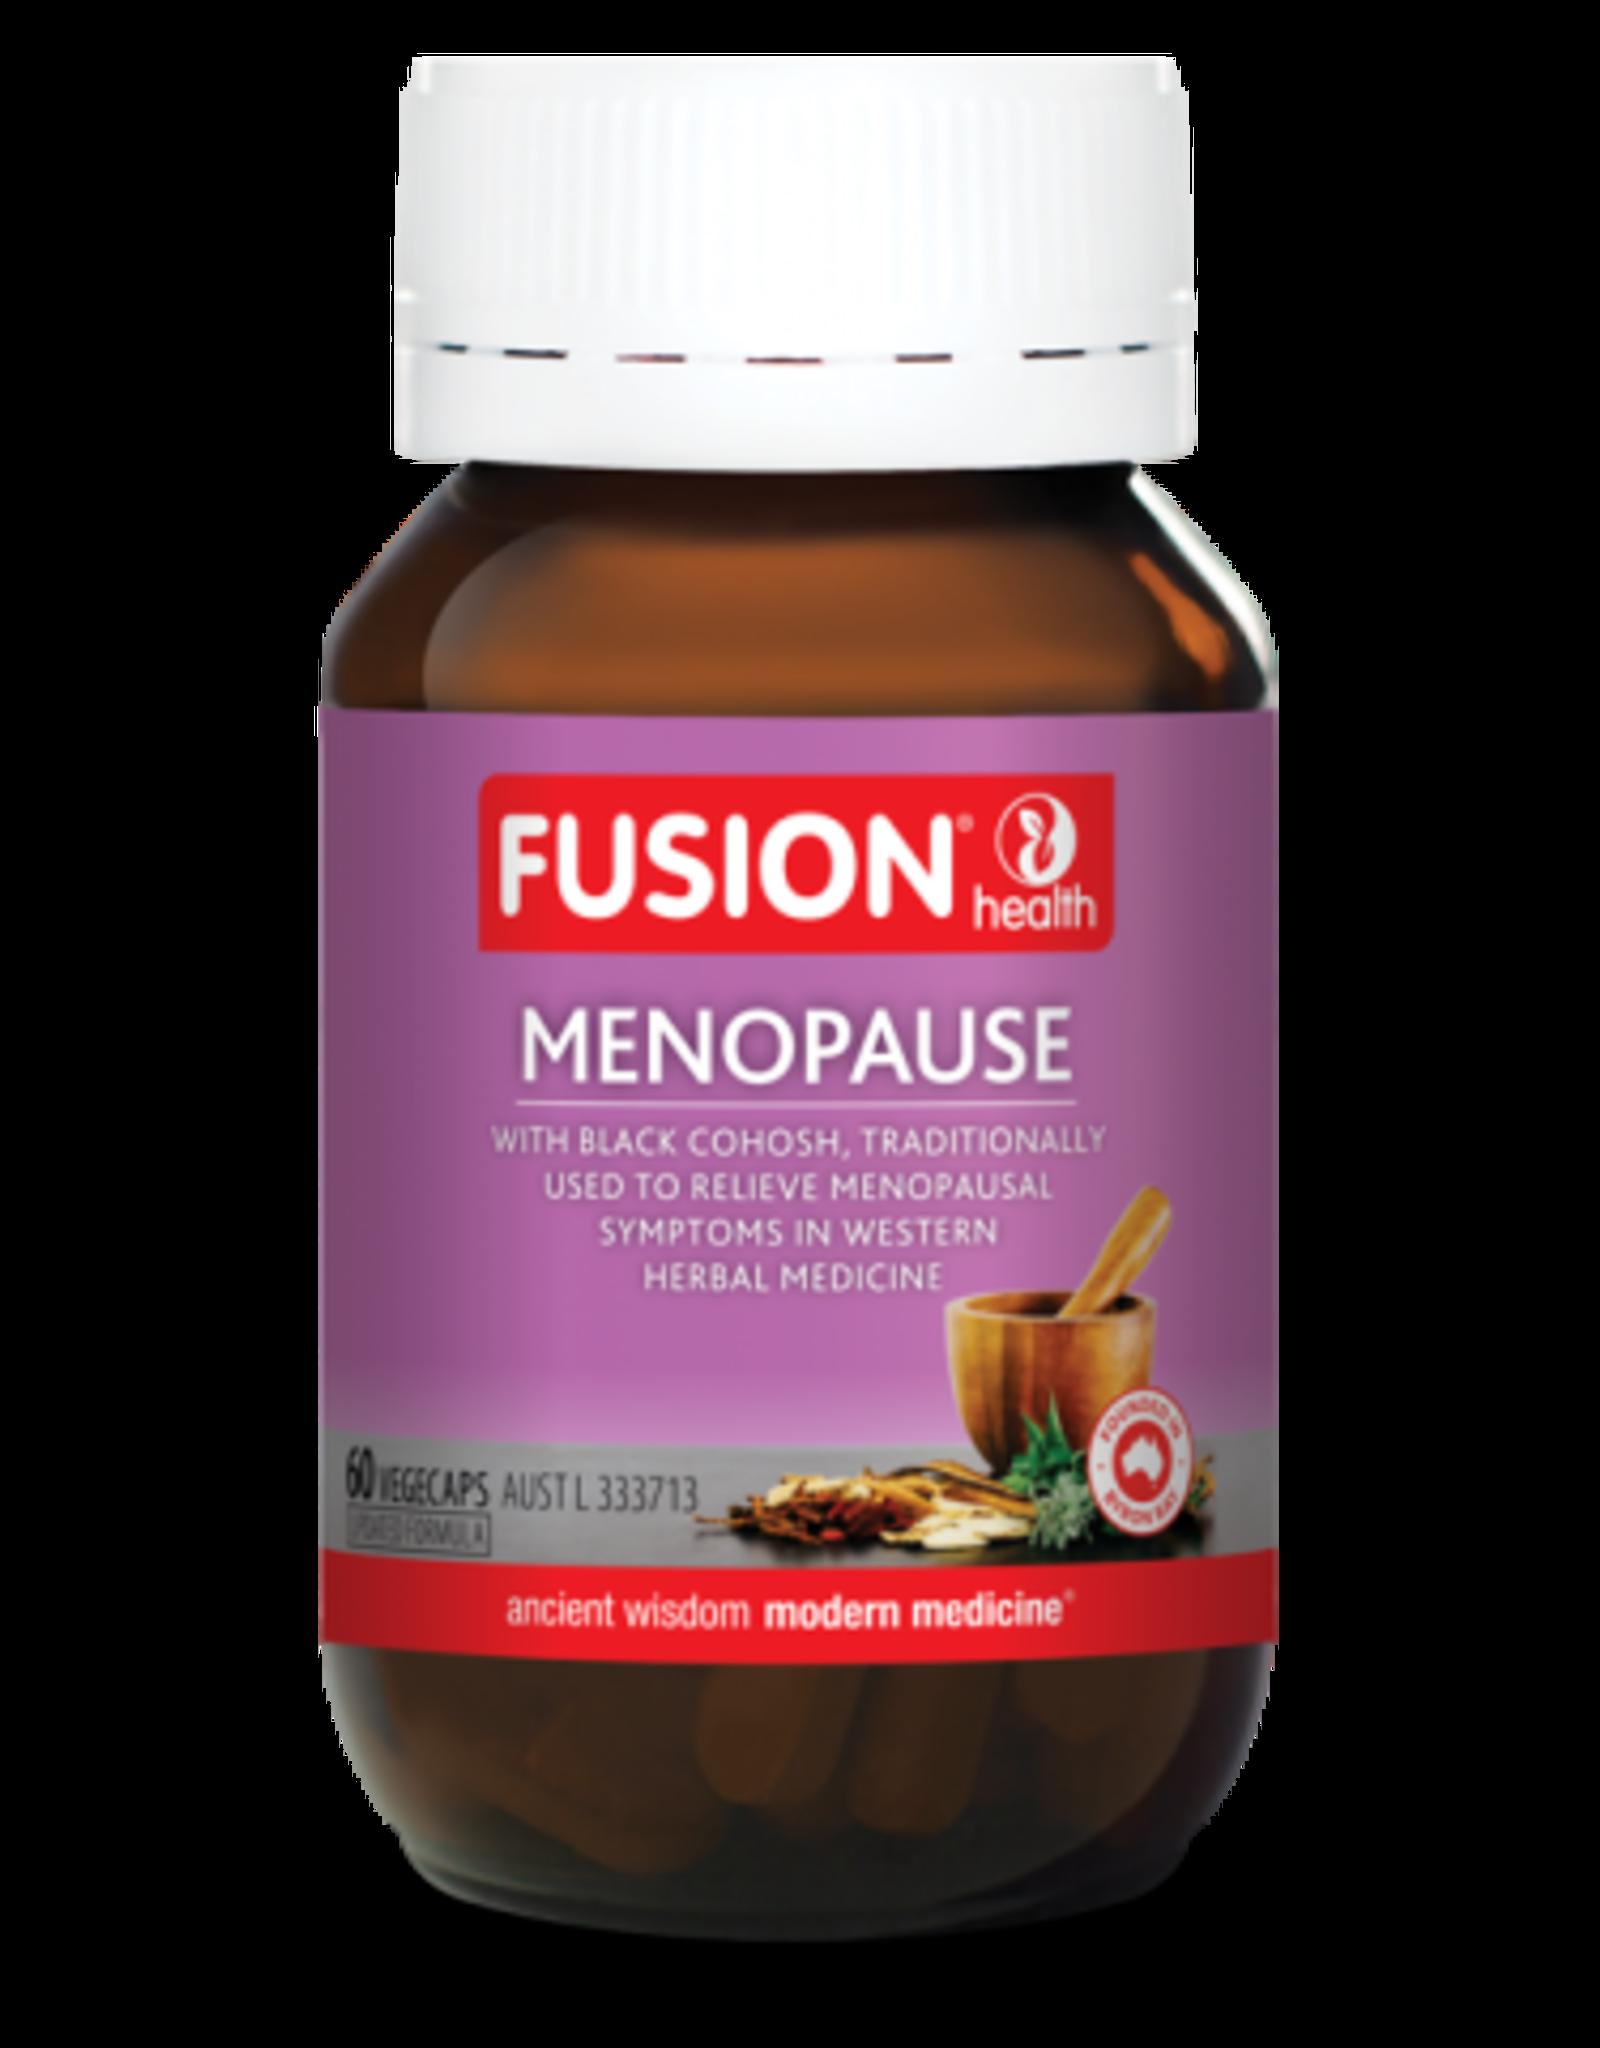 Fusion Menopause